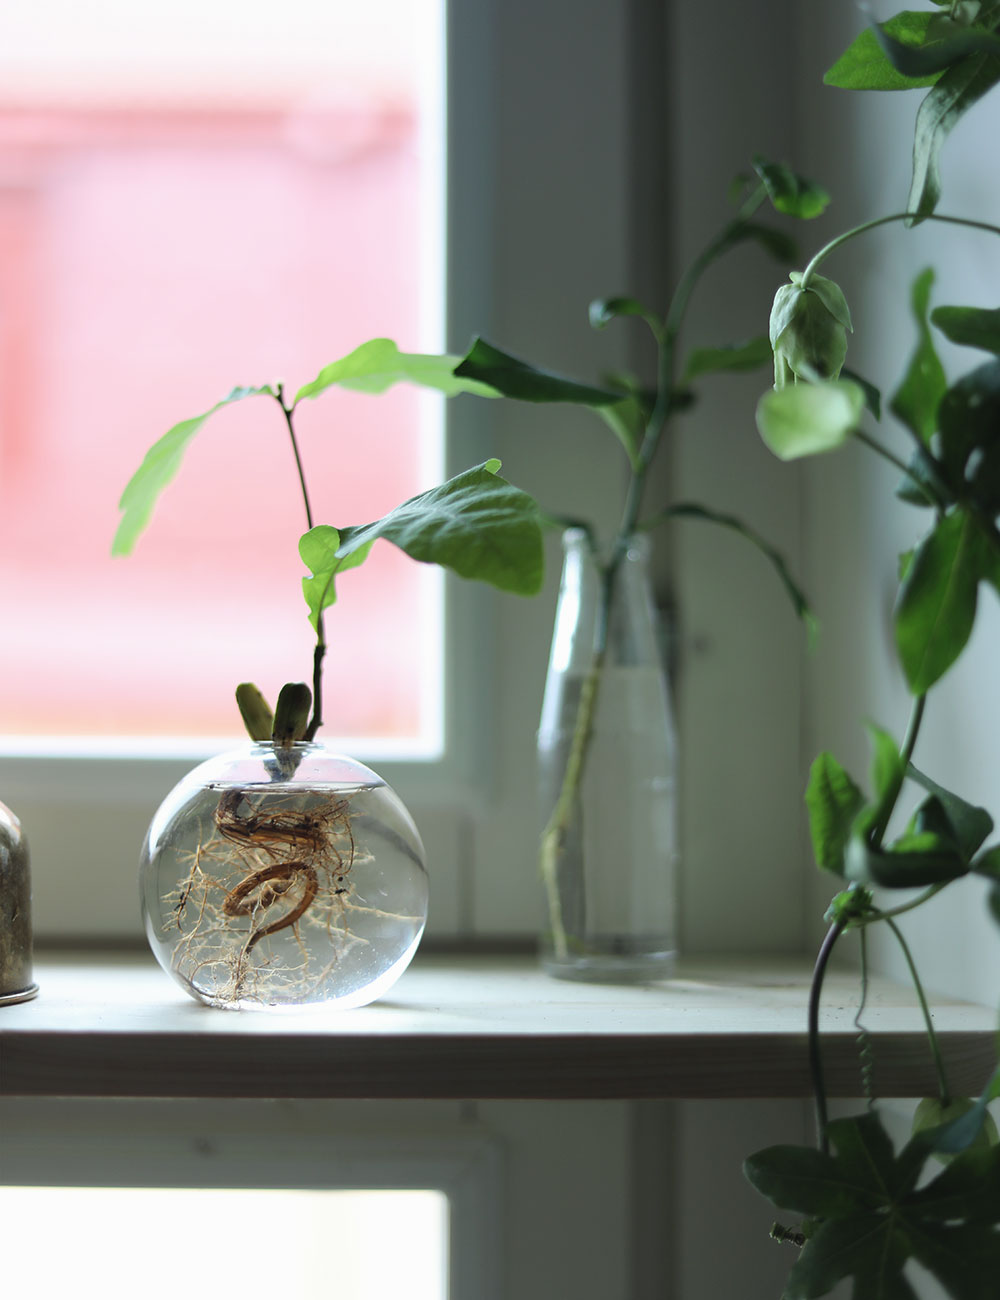 odla fönster klängerväxt ekollon